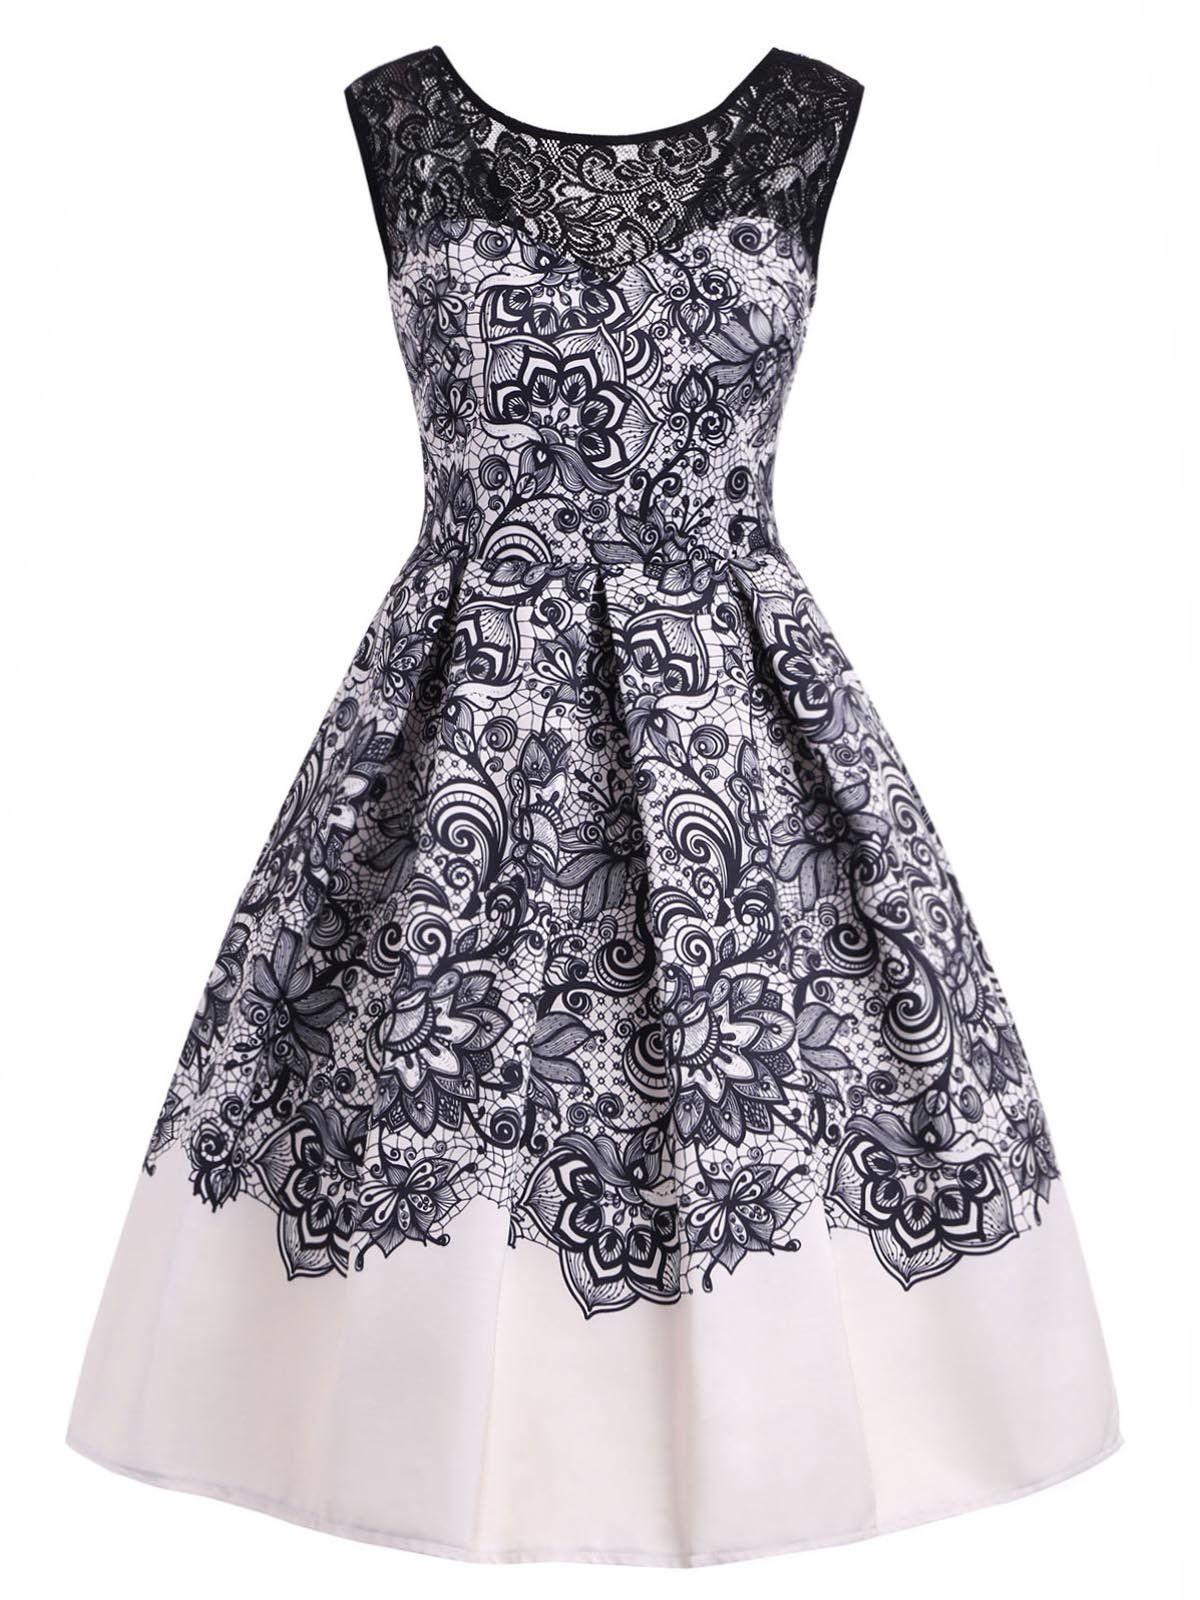 Blue 1950s Floral Sweetheart Swing Dress Dresses Vintage Dresses Cheap Frocks For Girls